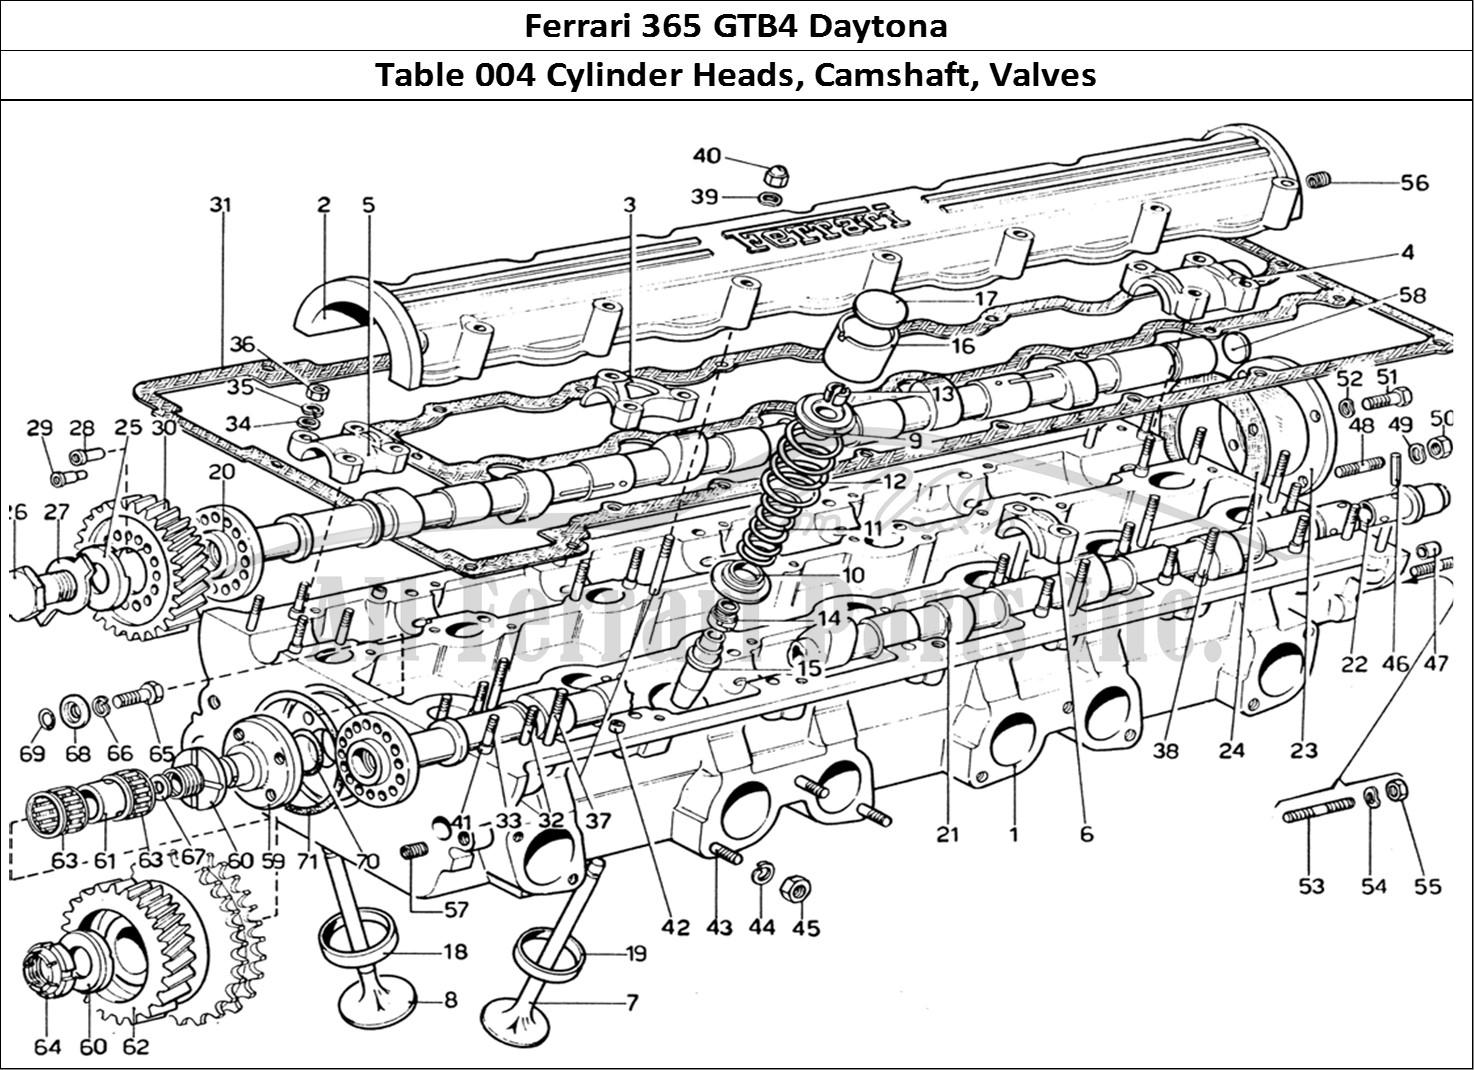 Buy original Ferrari 365 GTB4 Daytona 004 Cylinder Heads